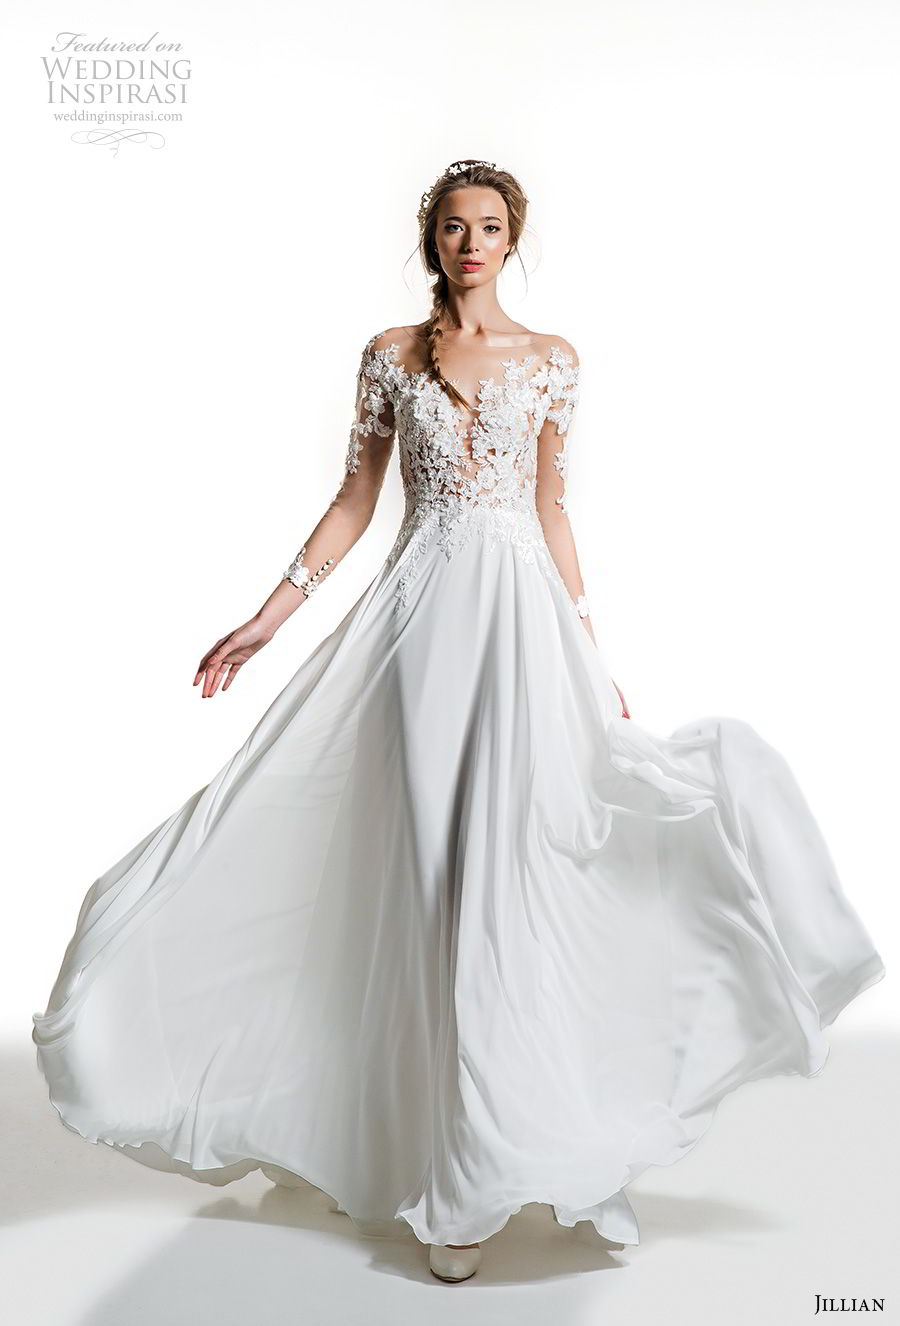 jillian 2019 bridal long sleeves illusion bateau plunging sweetheart neckline heavily embellished bodice romantic soft a  line wedding dress (8) mv